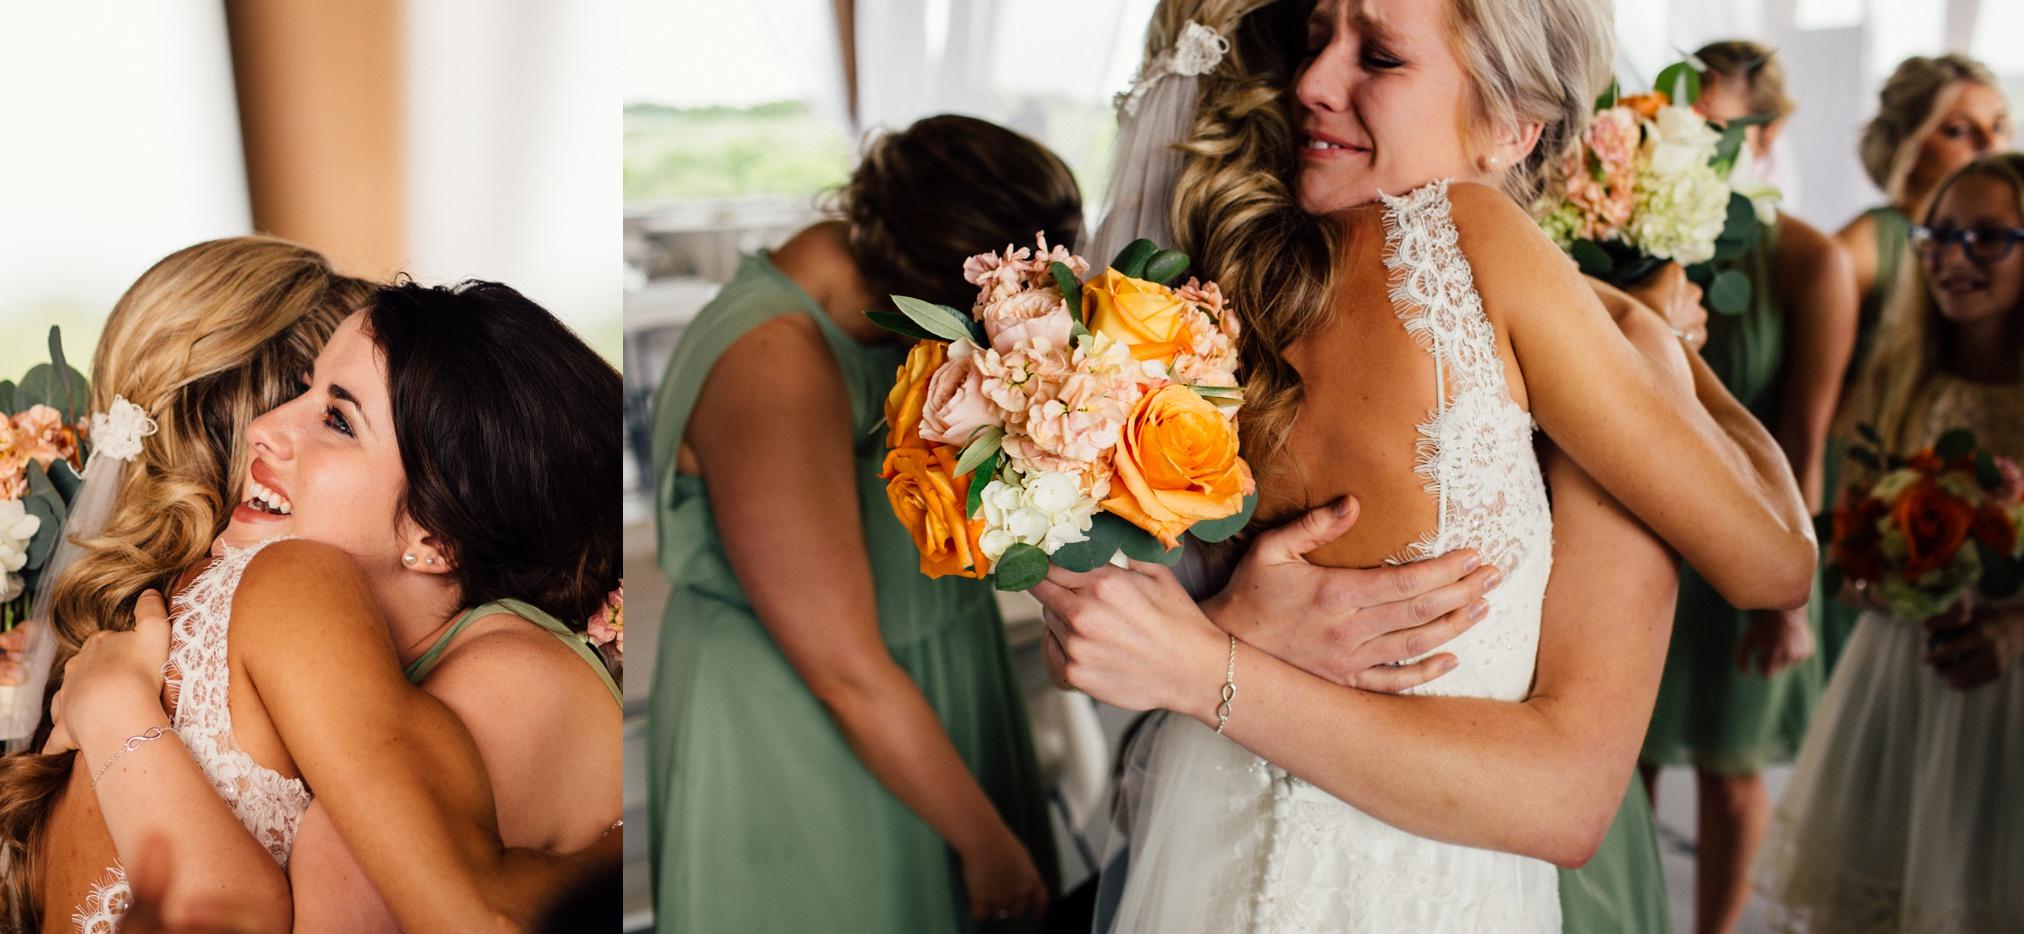 schmid_wedding-578.jpg